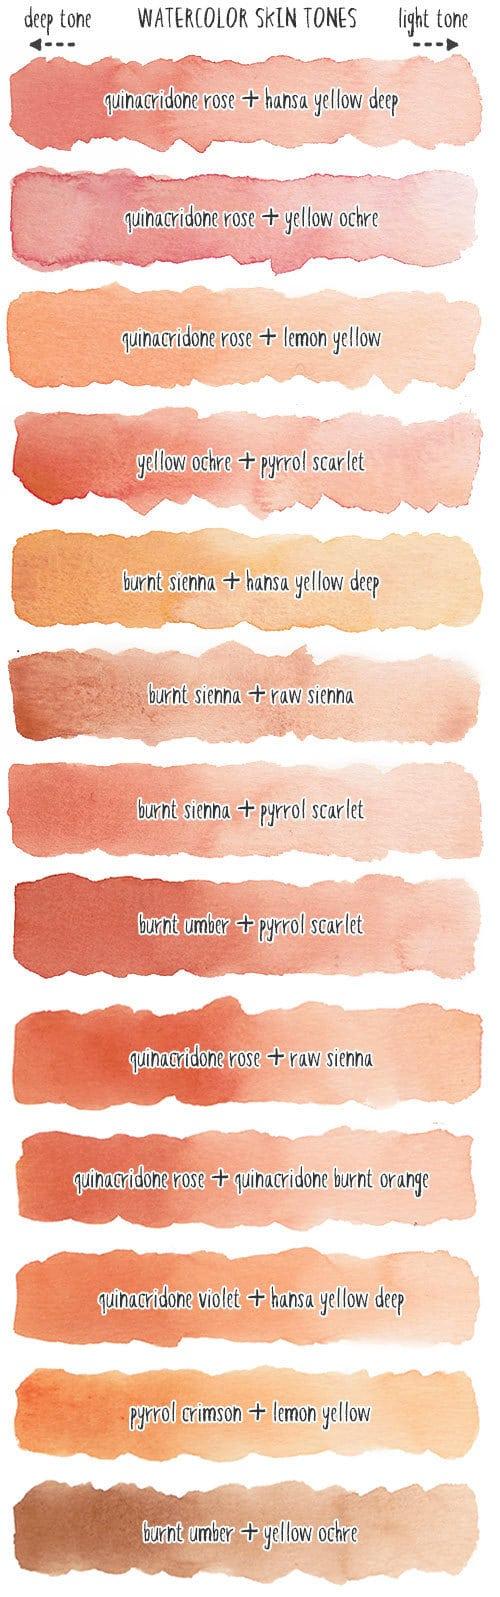 watercolor skin tone mixing chart